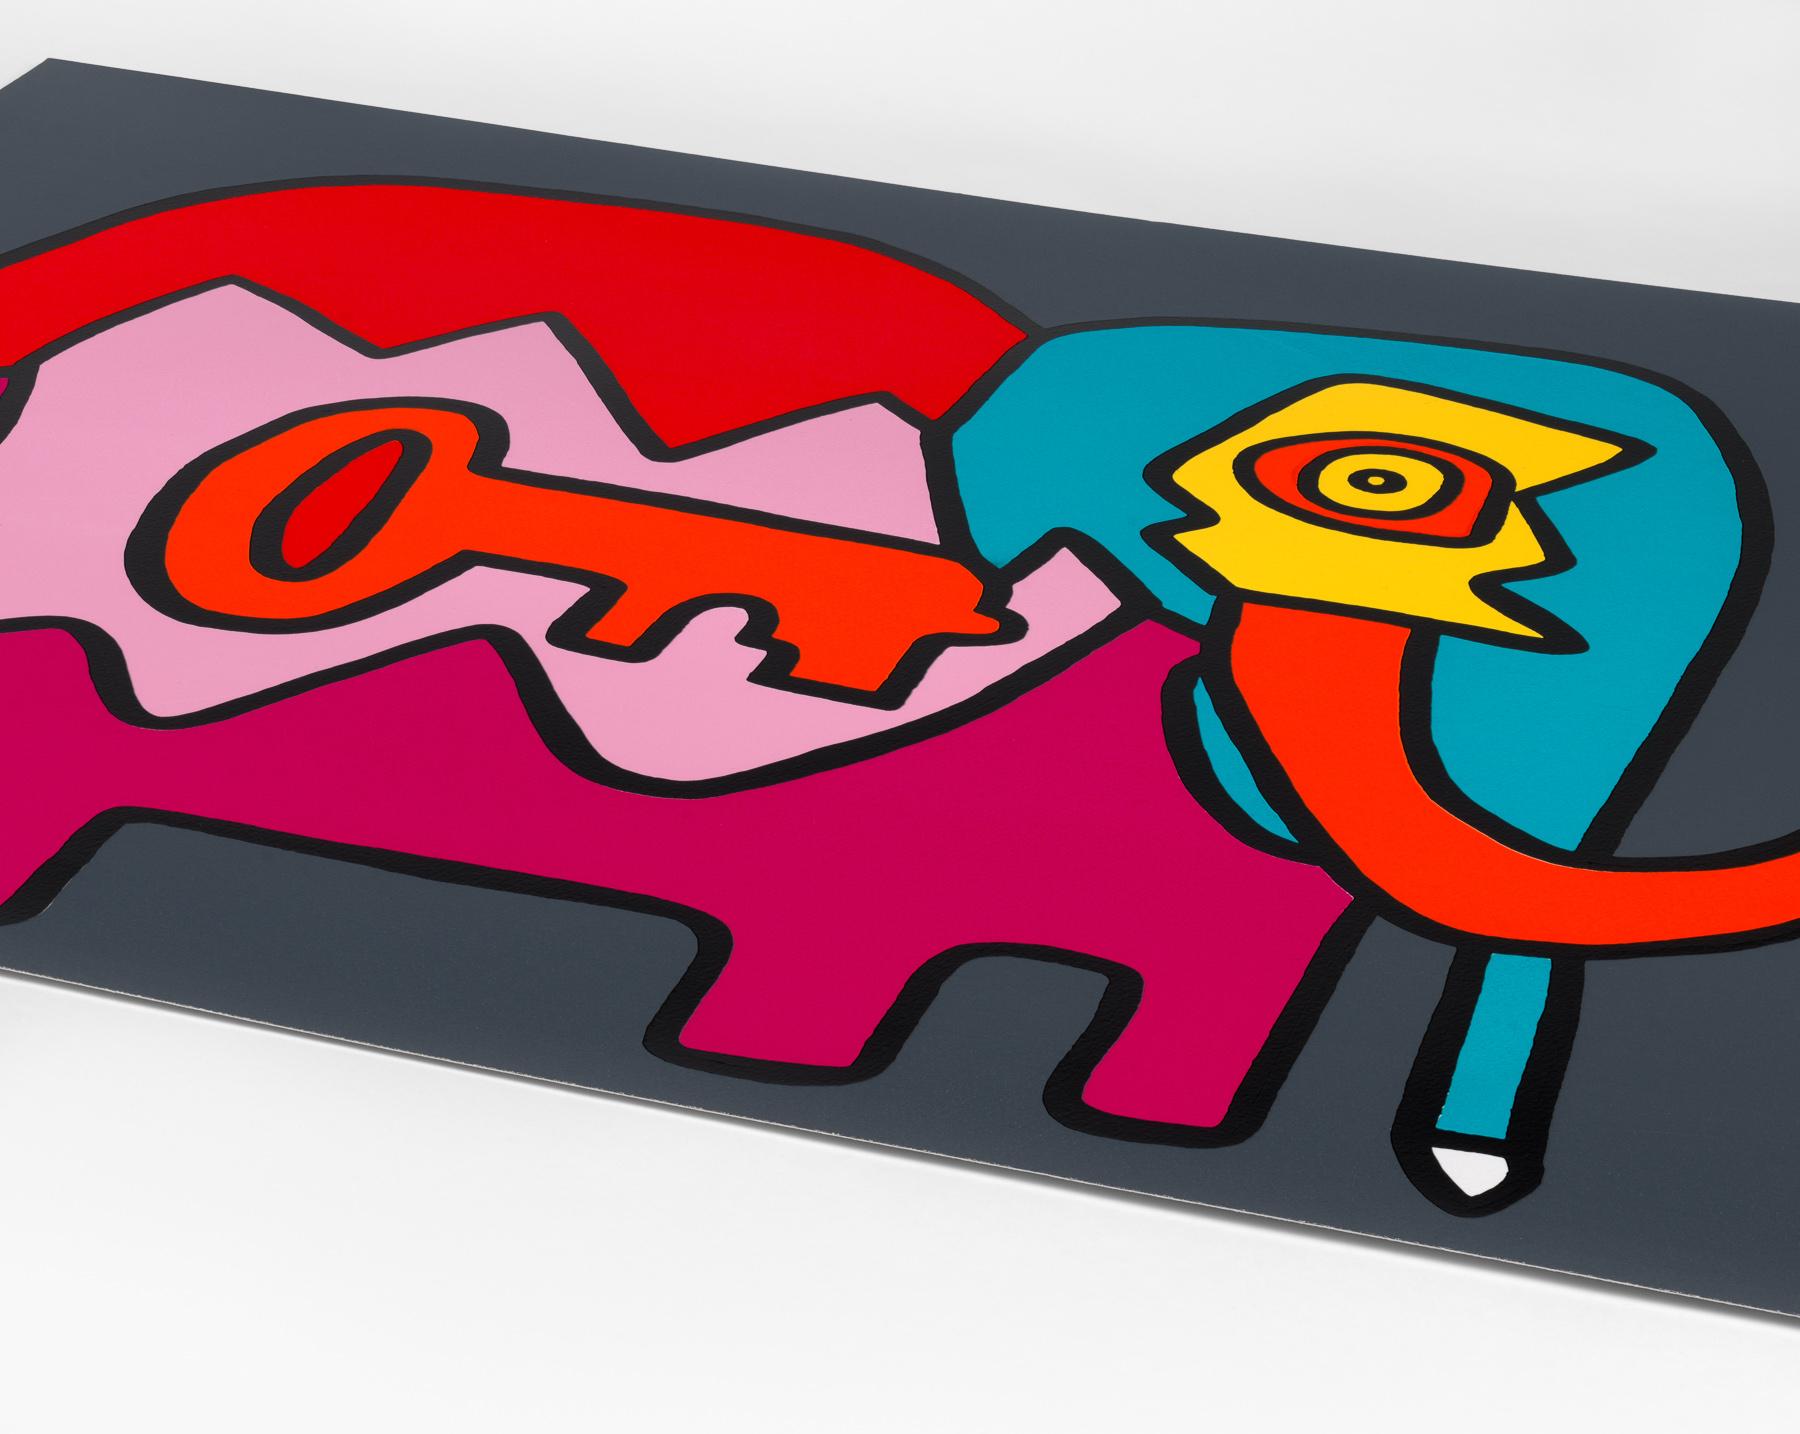 Thierry Noir - Elephant Key (Dark) (Detail)